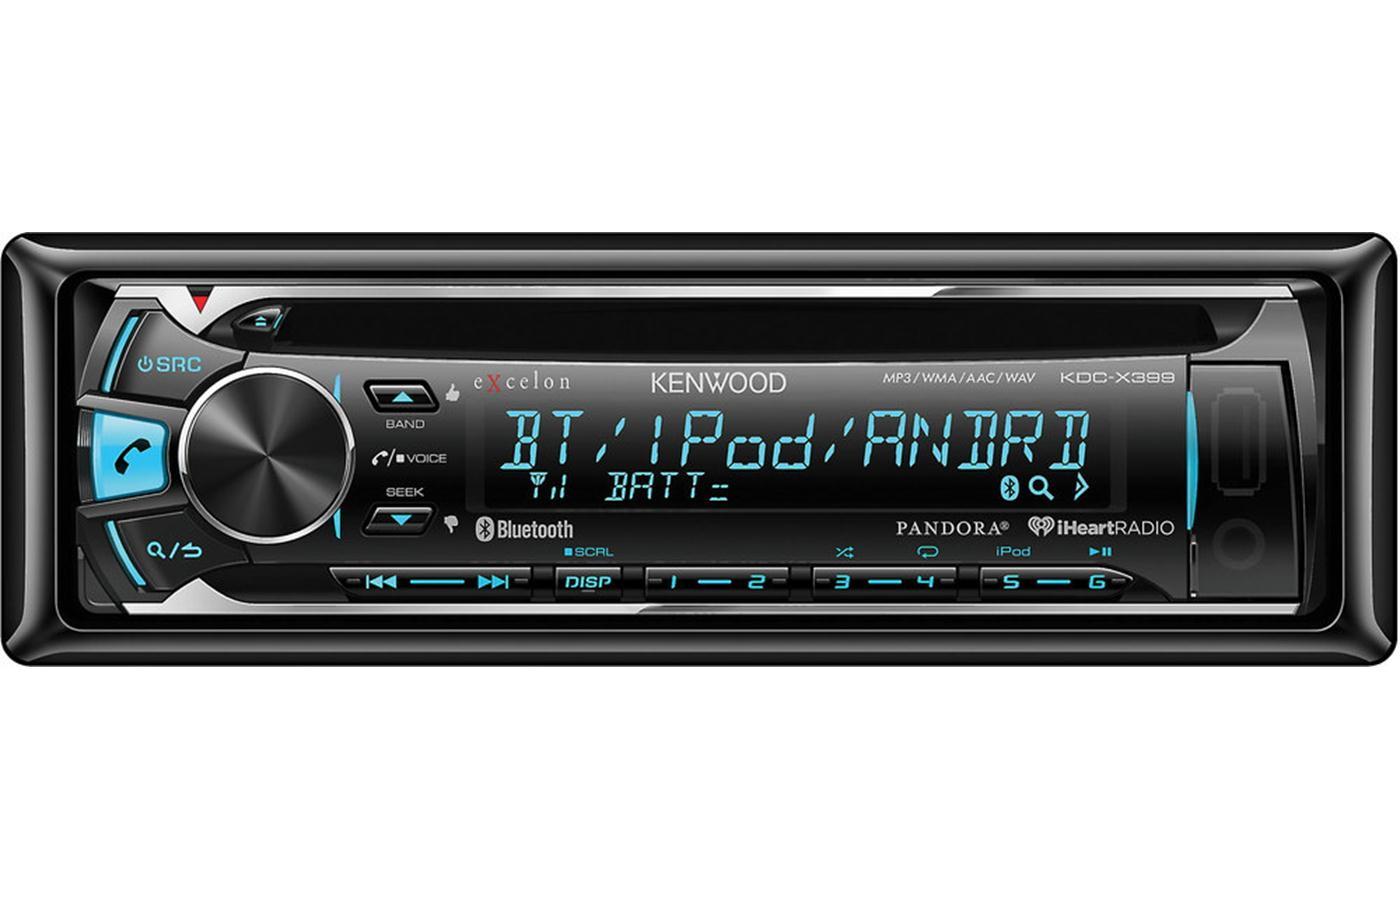 Kenwood Excelon Car Stereo Gotteamdesigns Kdc X589 Wiring Diagram